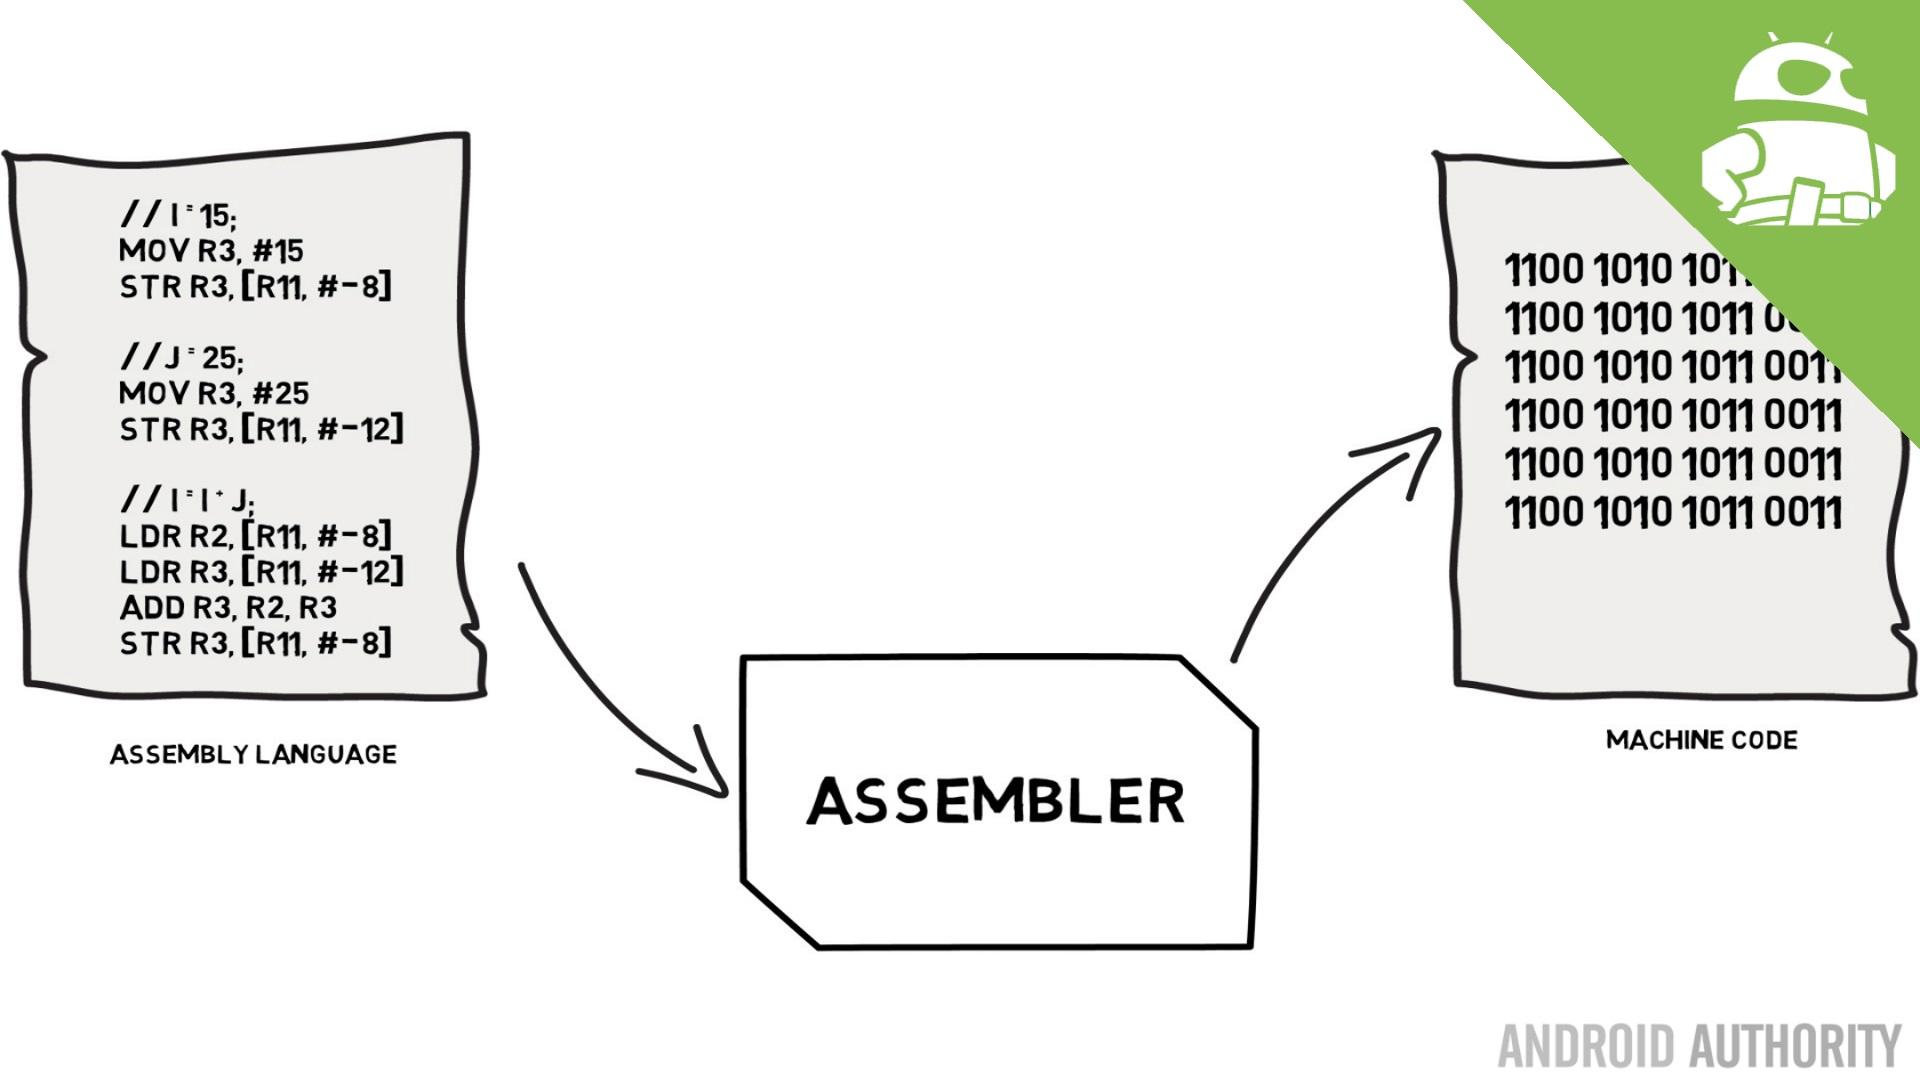 Assembly language and machine code - Gary explains